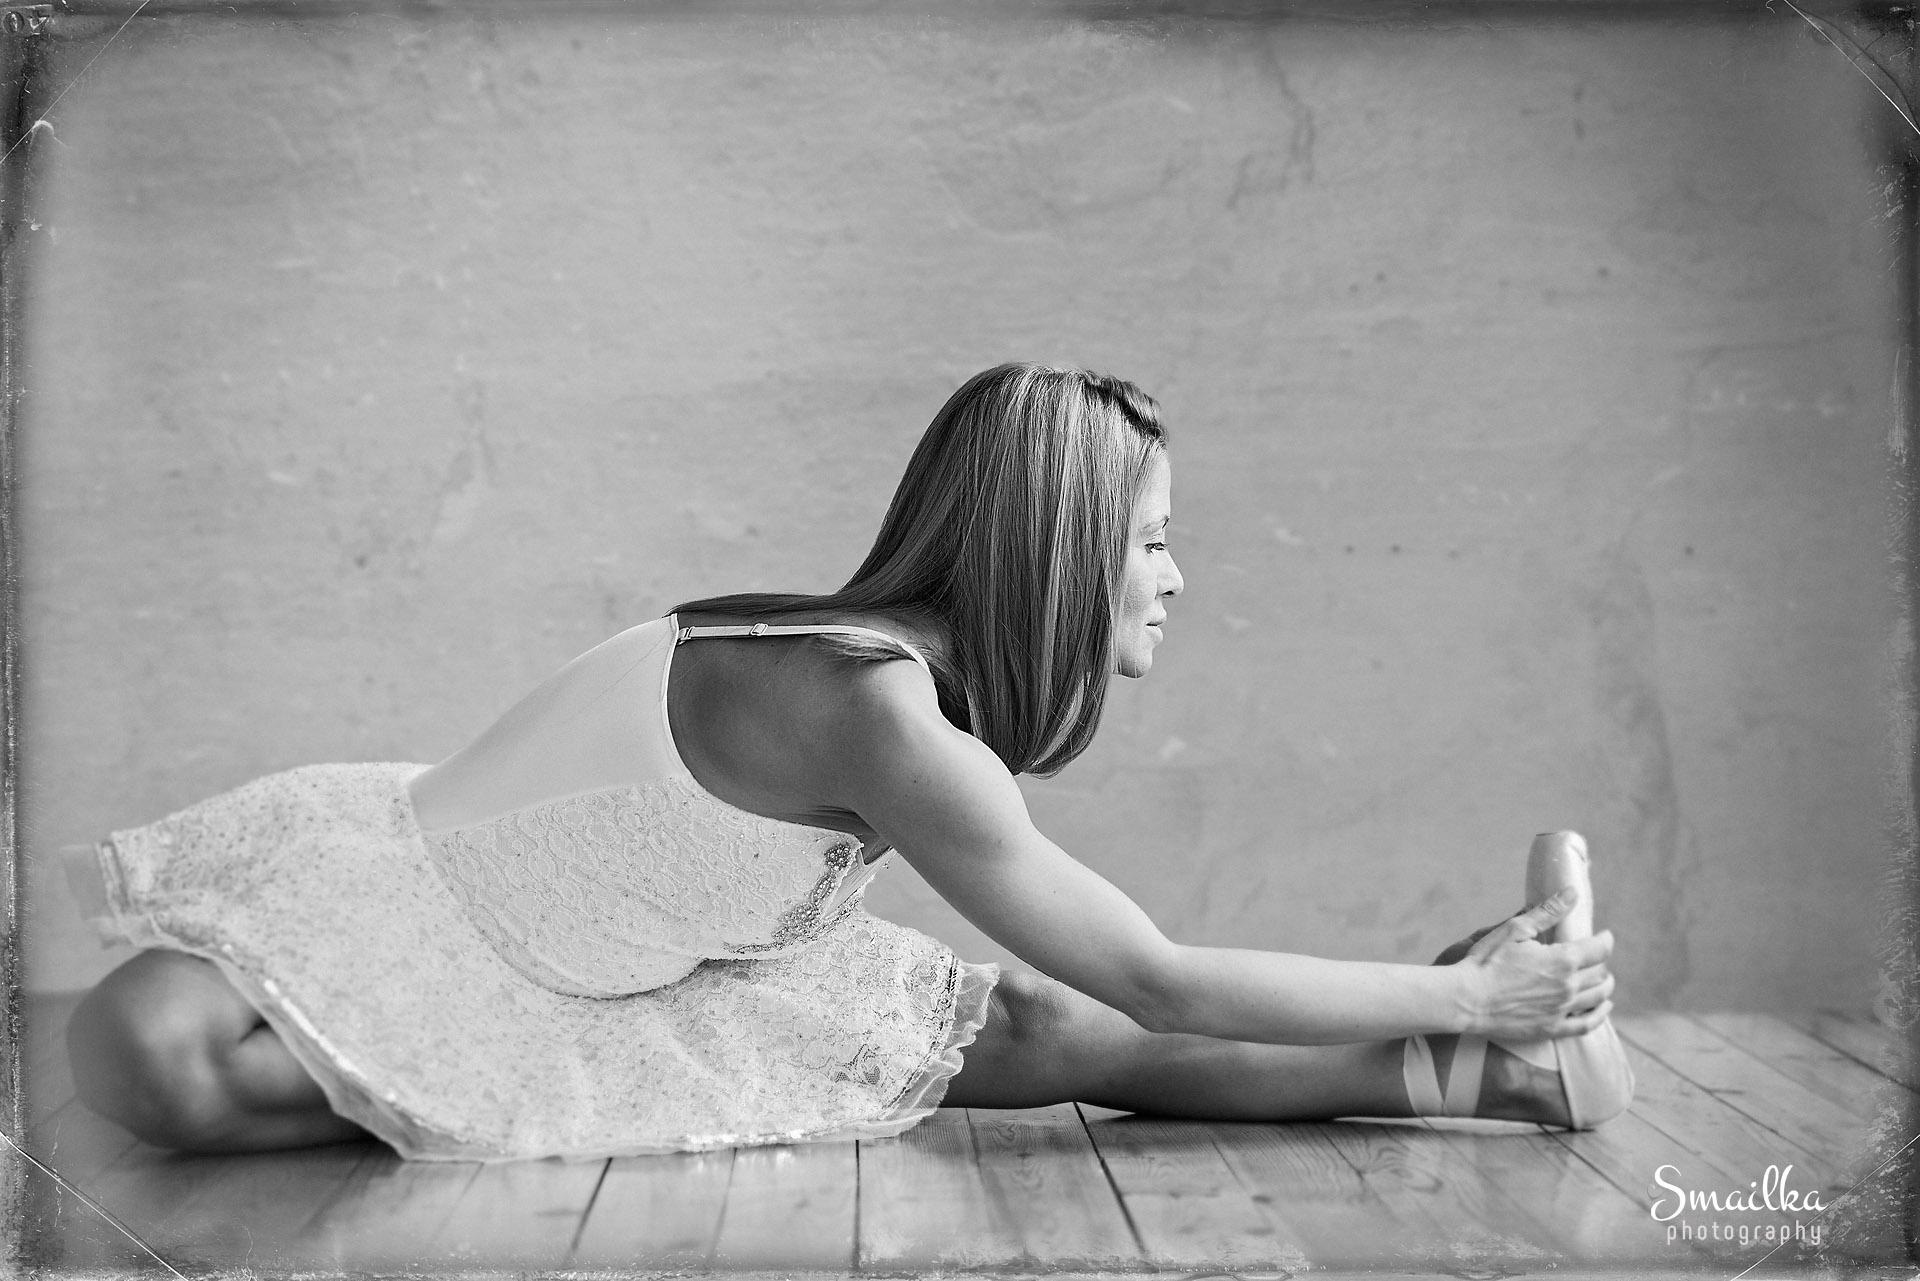 Ballerina stretching Yanica Dobrich